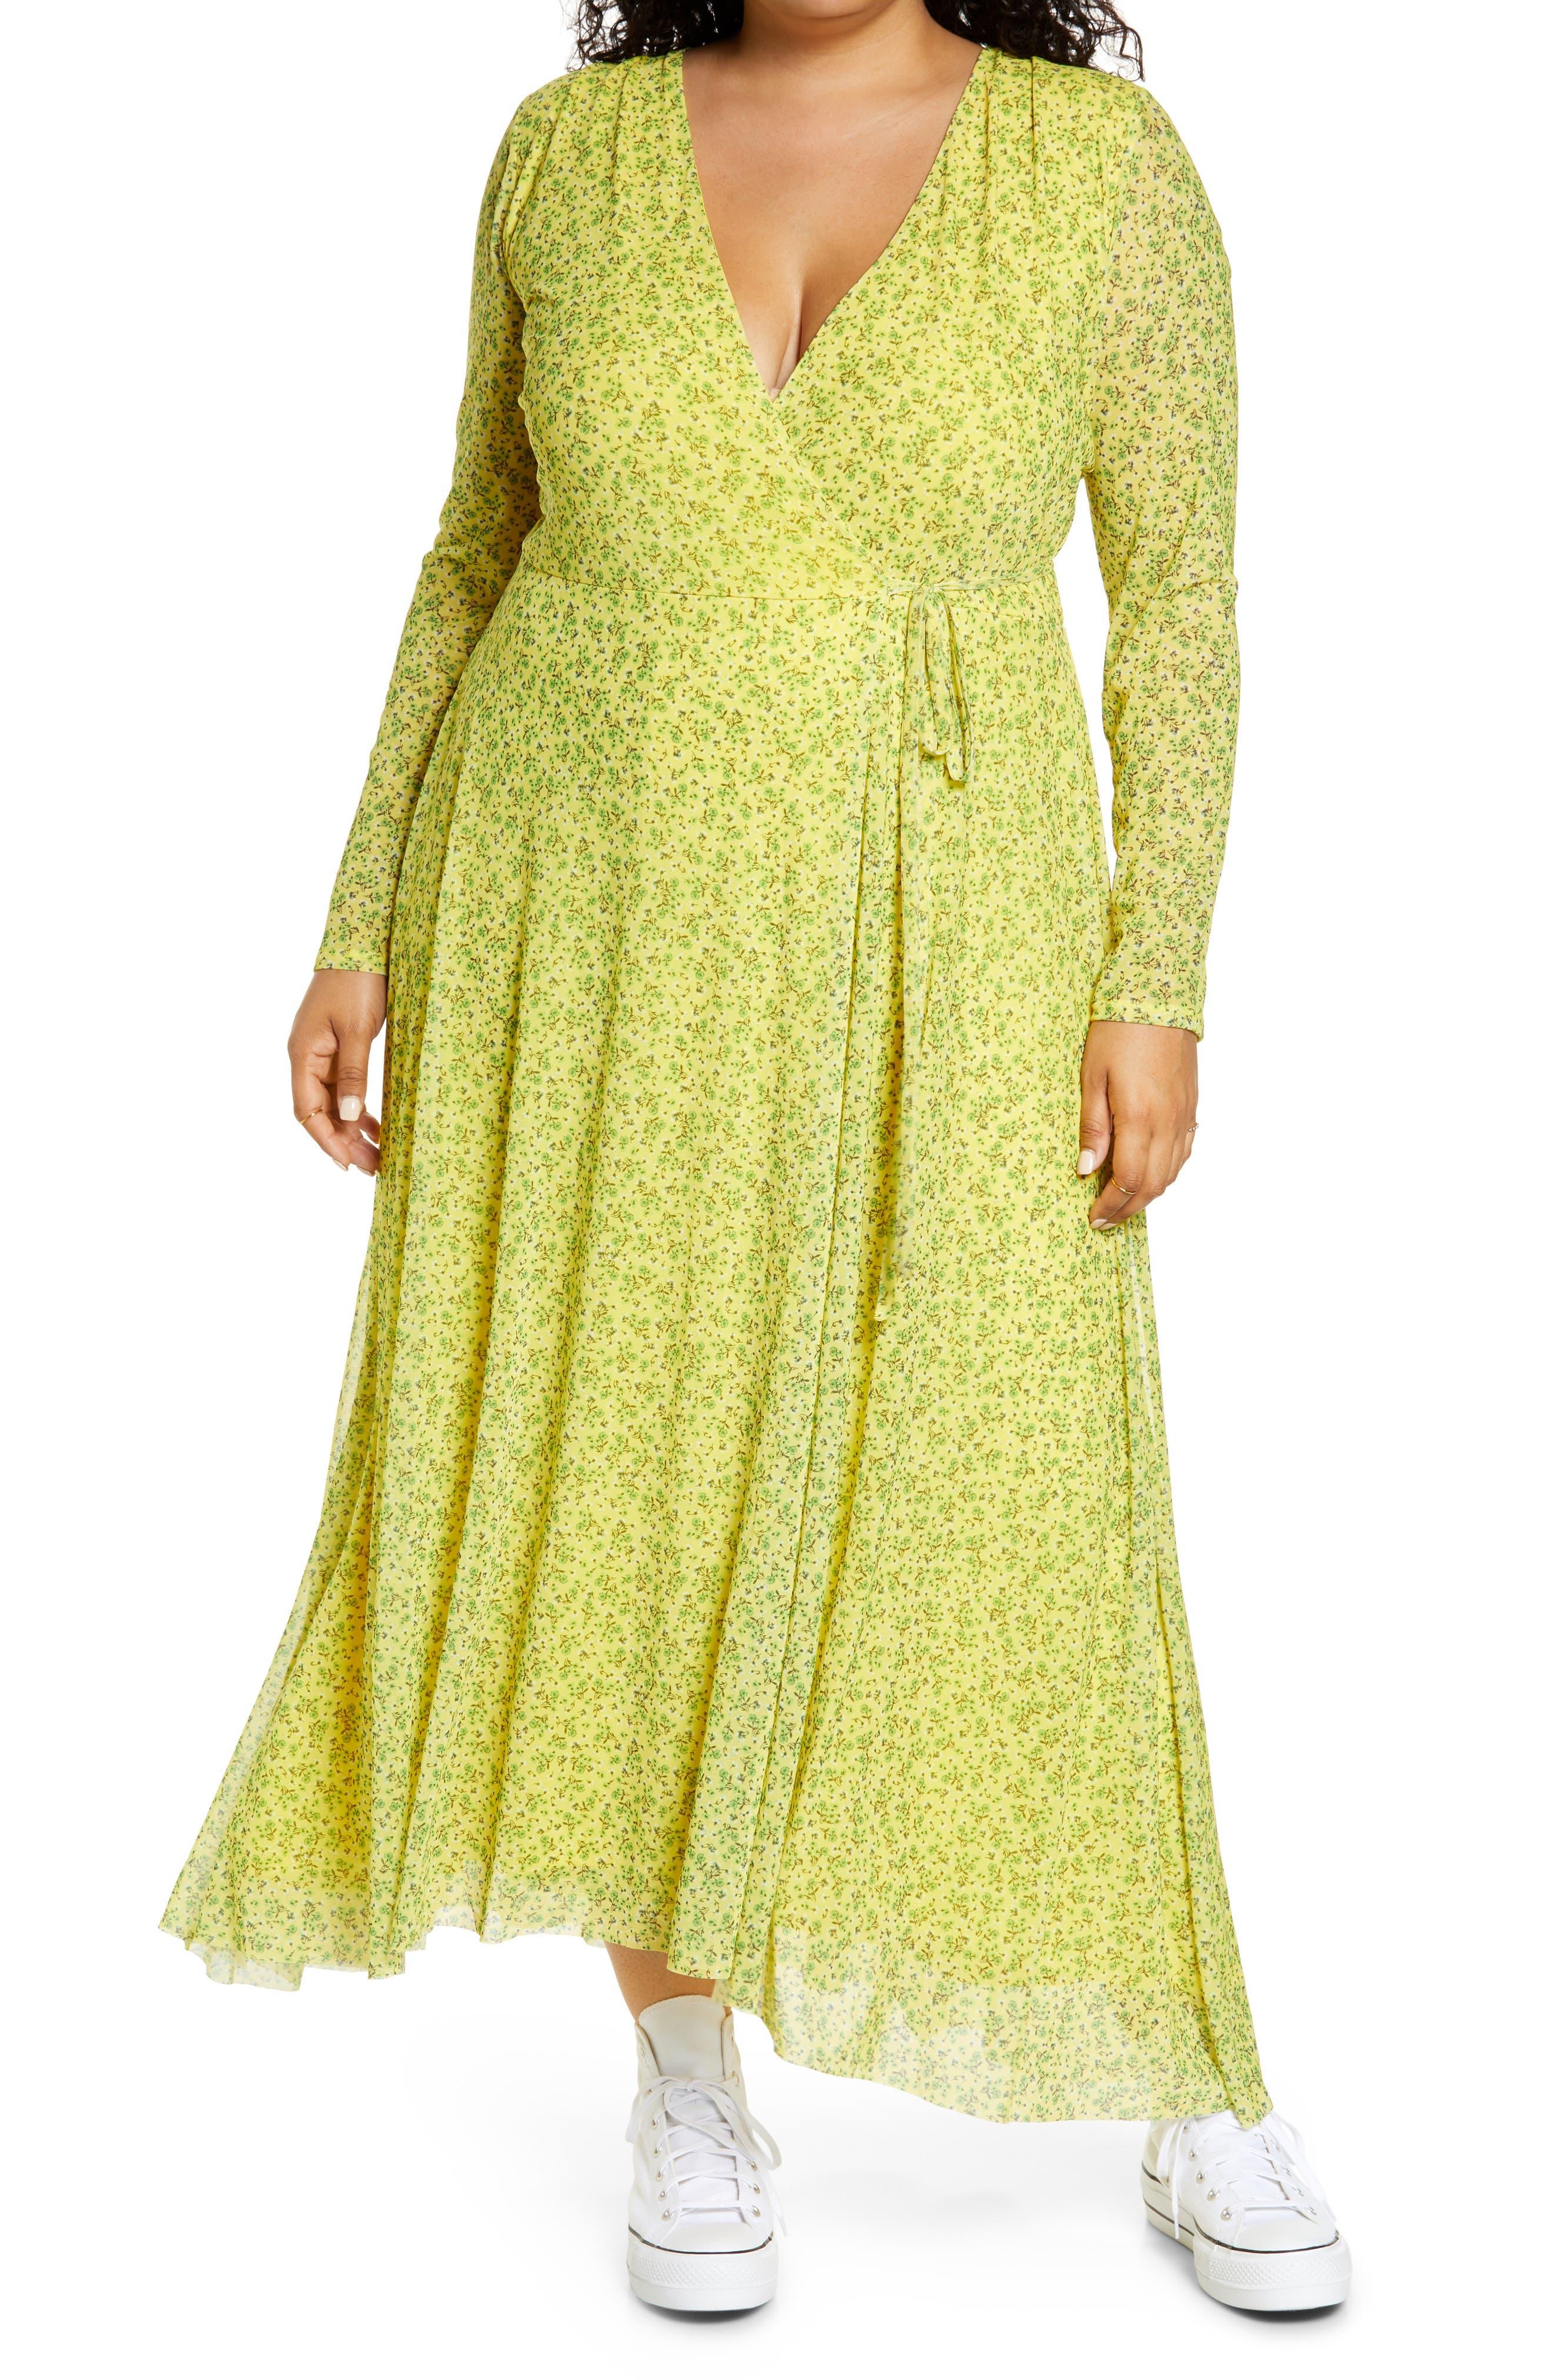 Wyatt Long Sleeve Wrap Dress